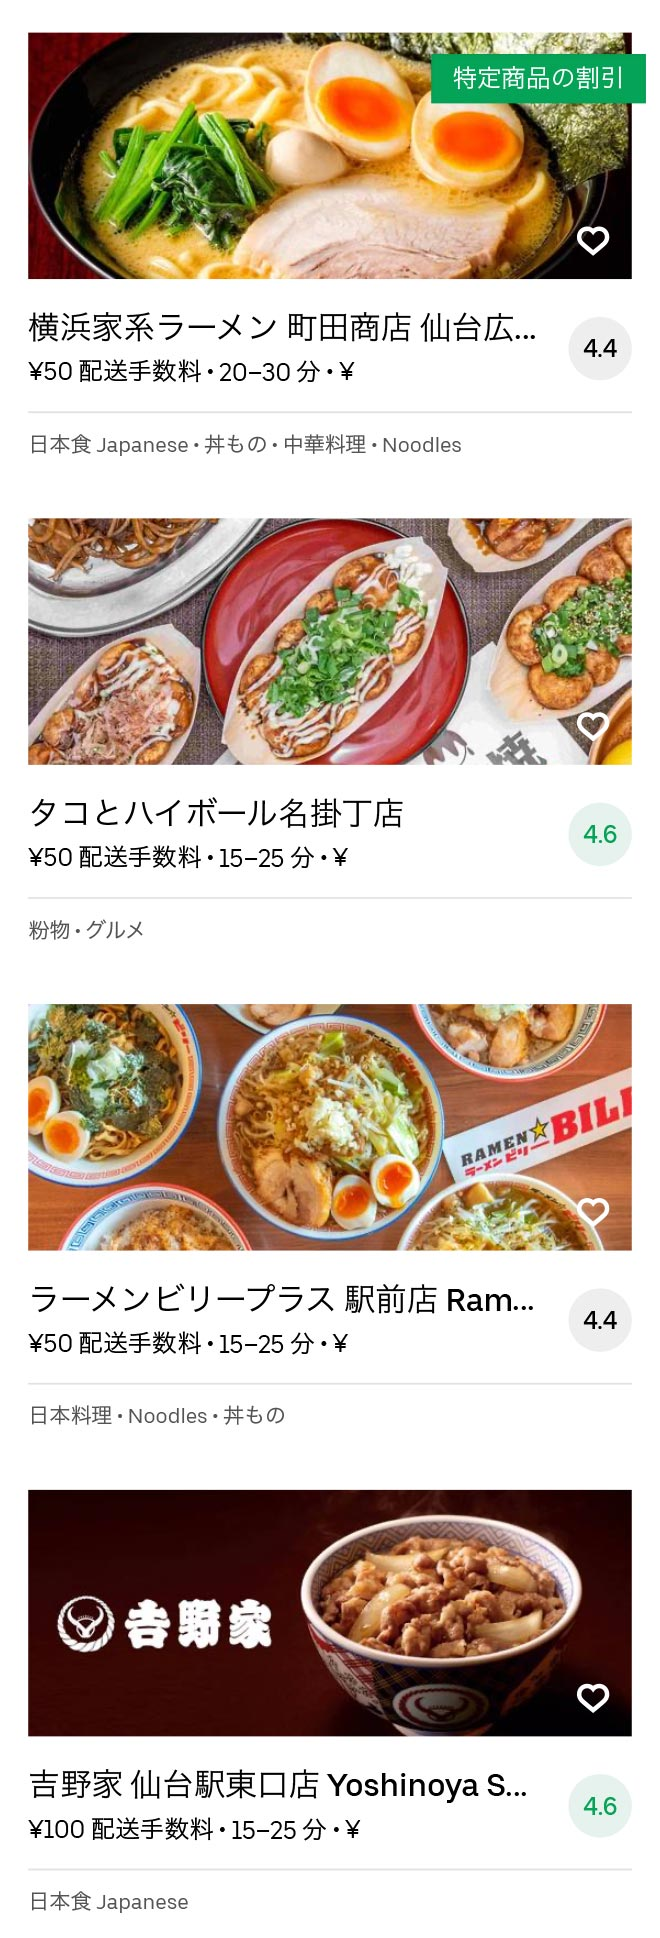 Sendai menu 2008 06